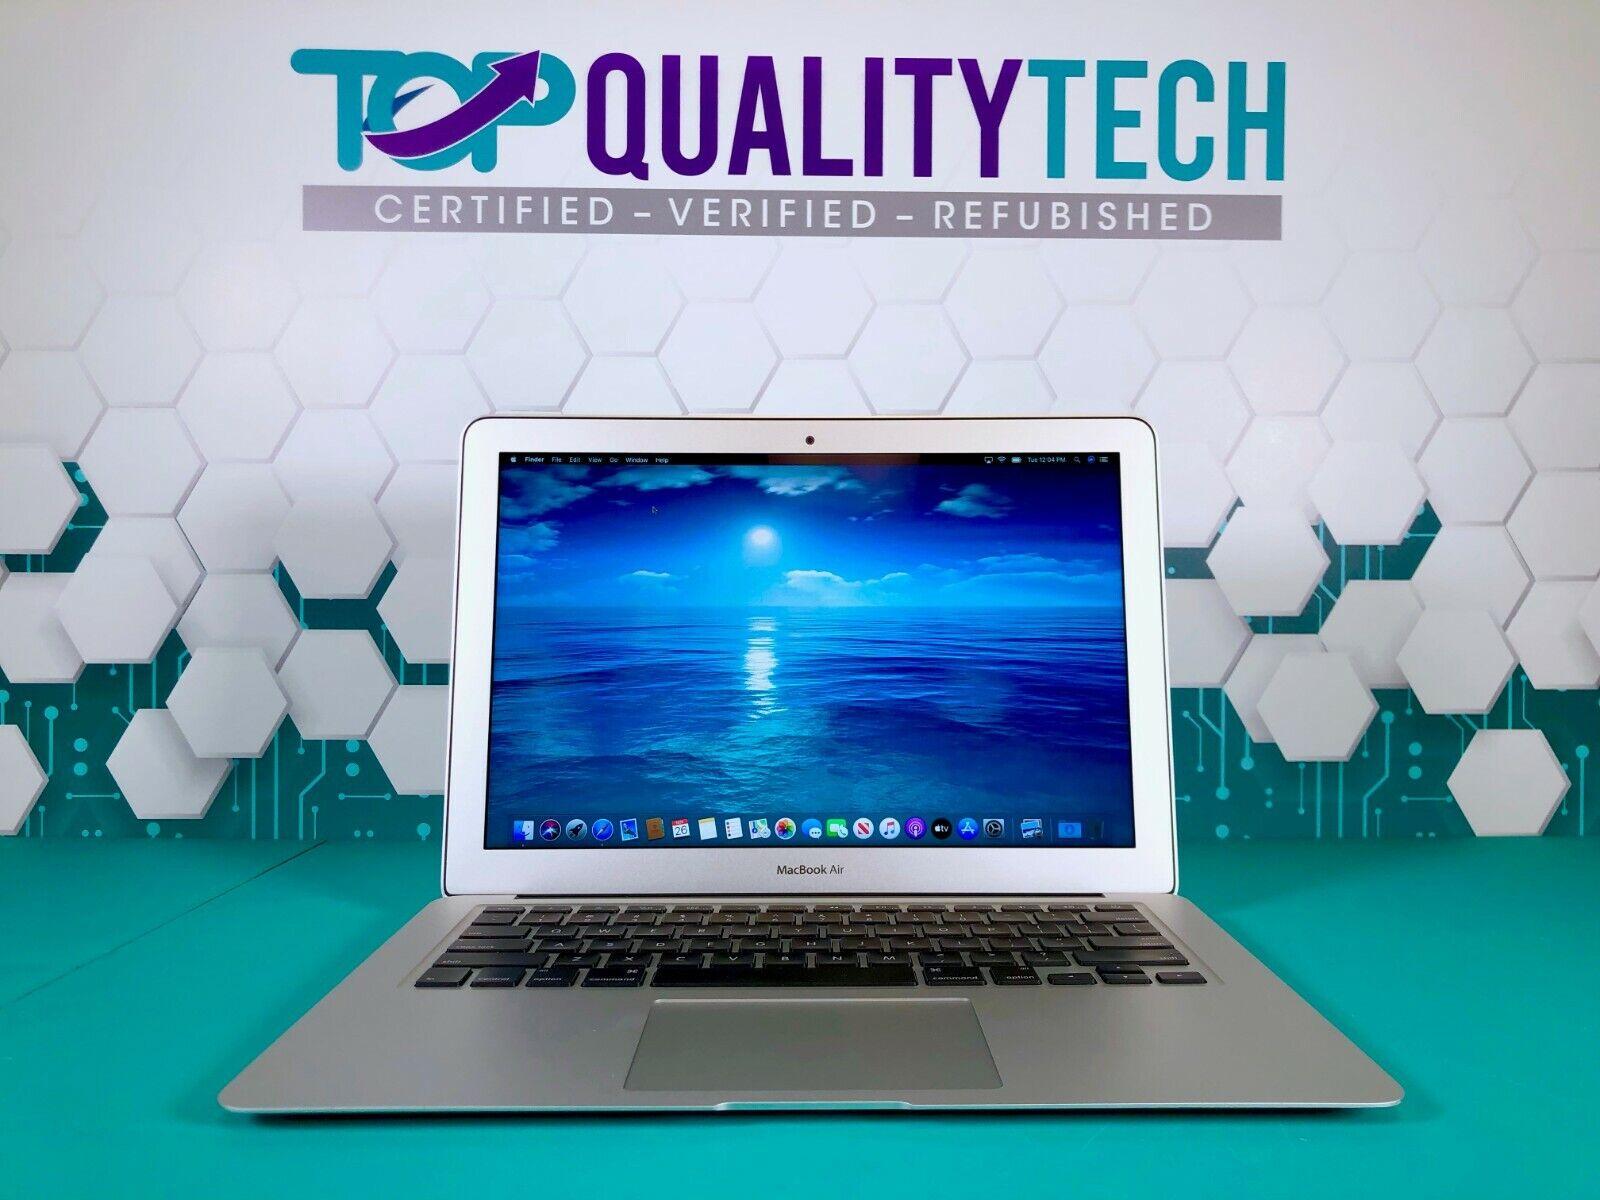 Apple MacBook Air 13 inch Laptop / 3 YEAR WARRANTY / 256GB SSD + BONUS / OS-2020. Buy it now for 649.00